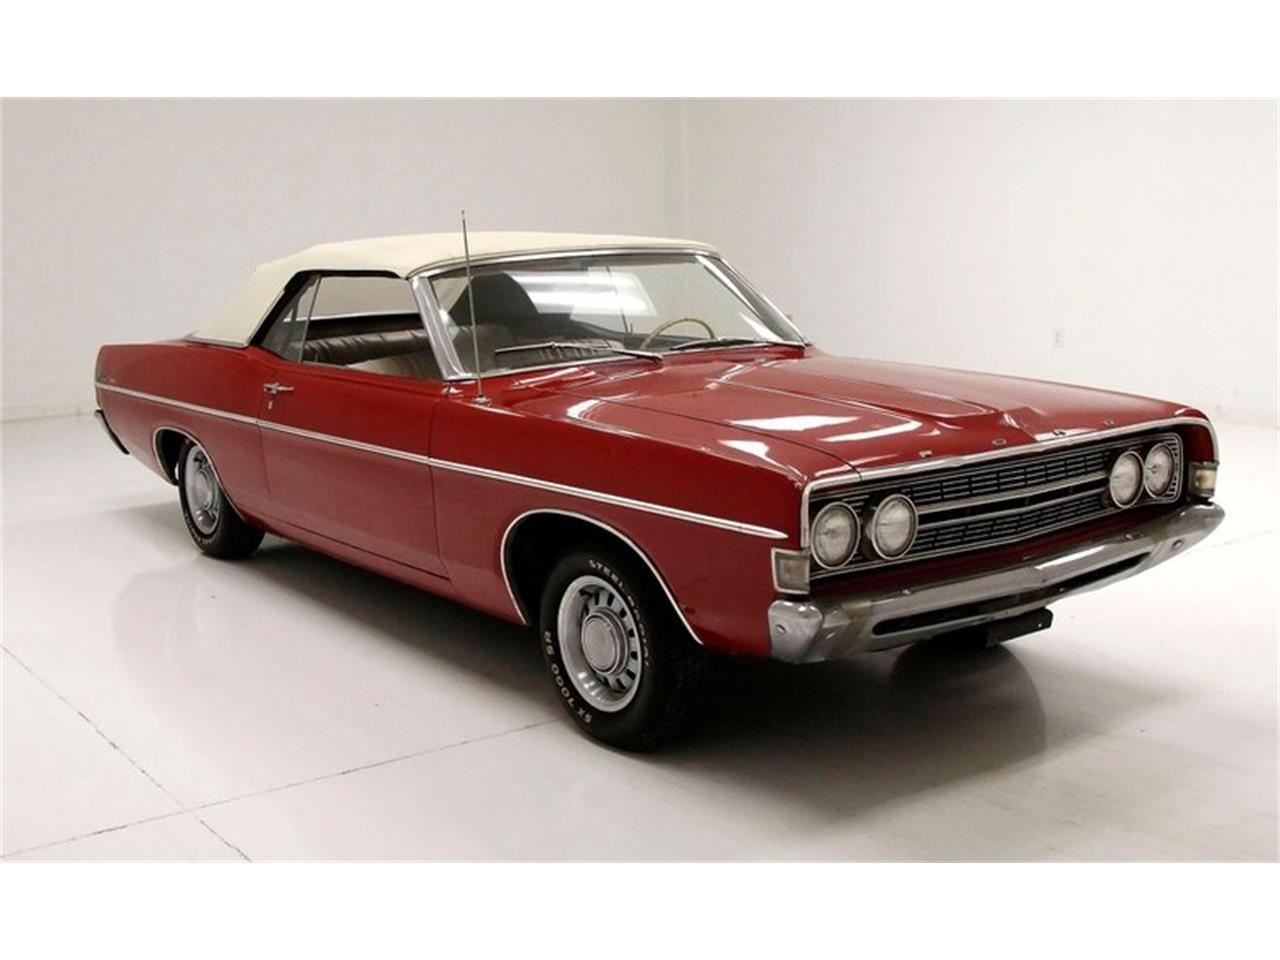 1968 Ford Fairlane (CC-1314880) for sale in Morgantown, Pennsylvania